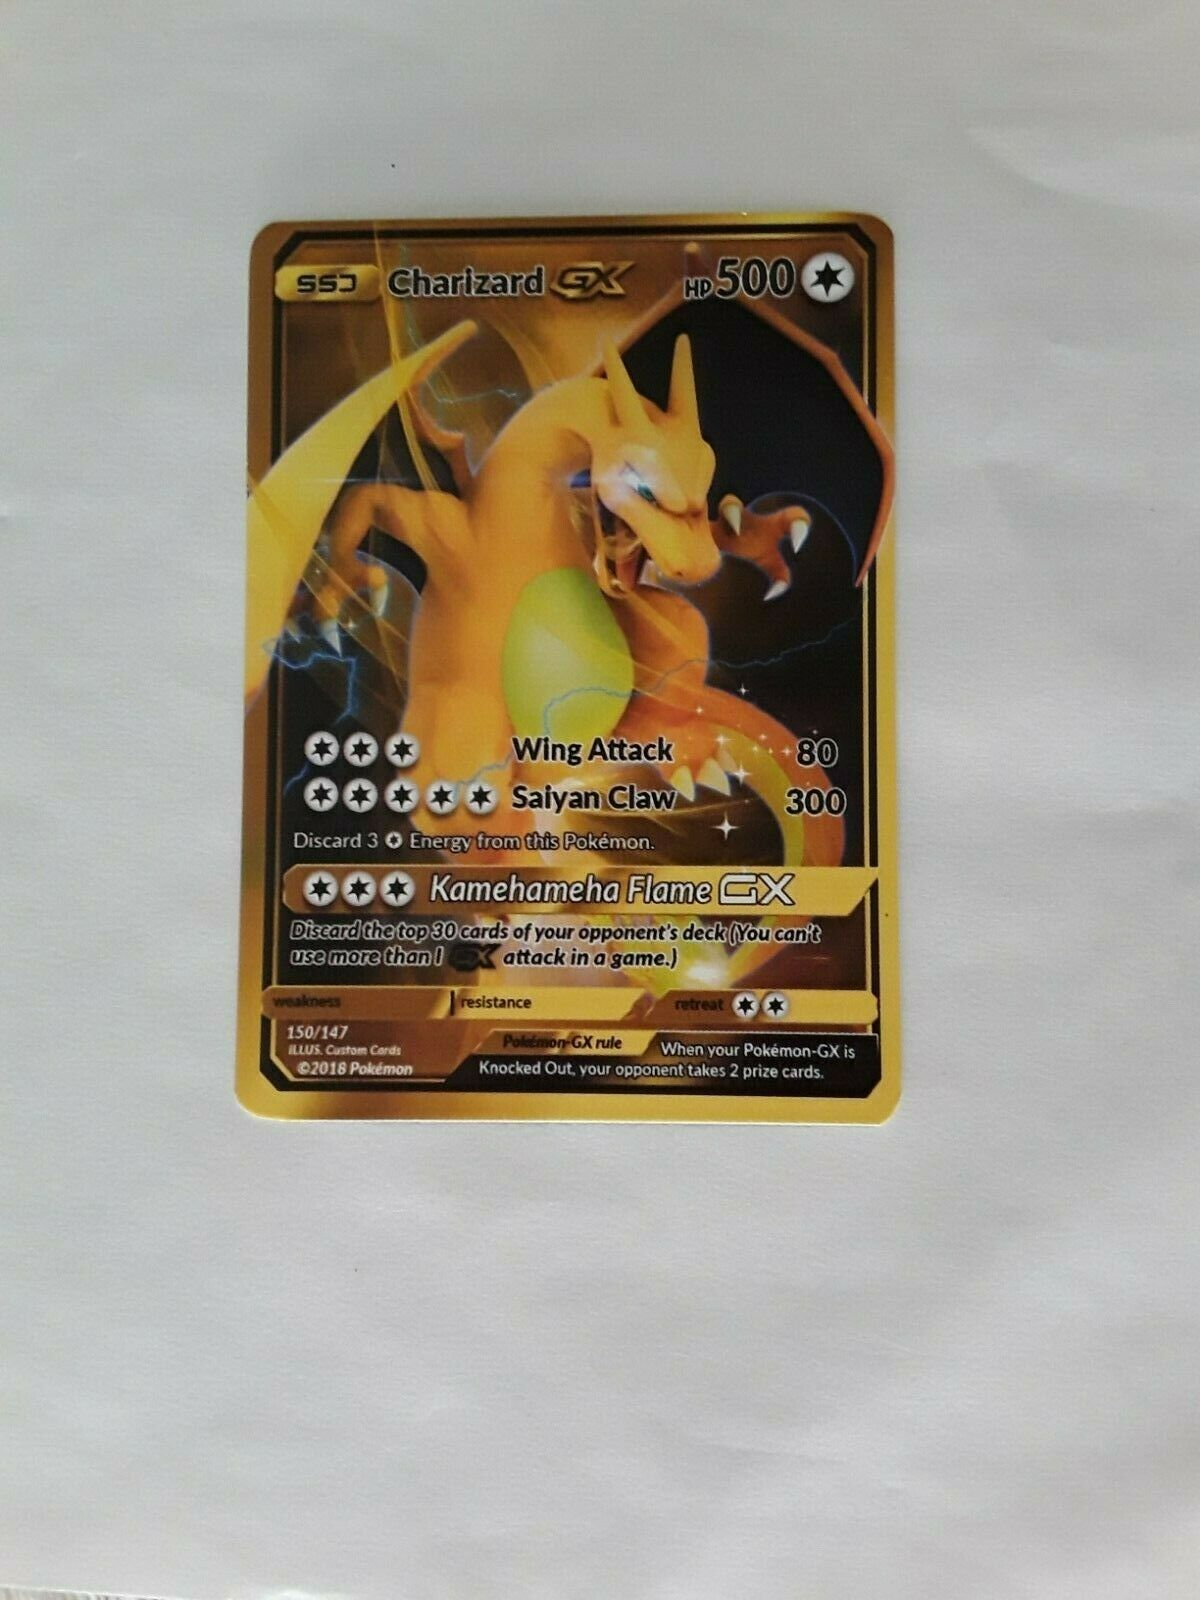 Pokemon Card Gold Charizard Gx Pokemon Cards Ideas Of Pokemon